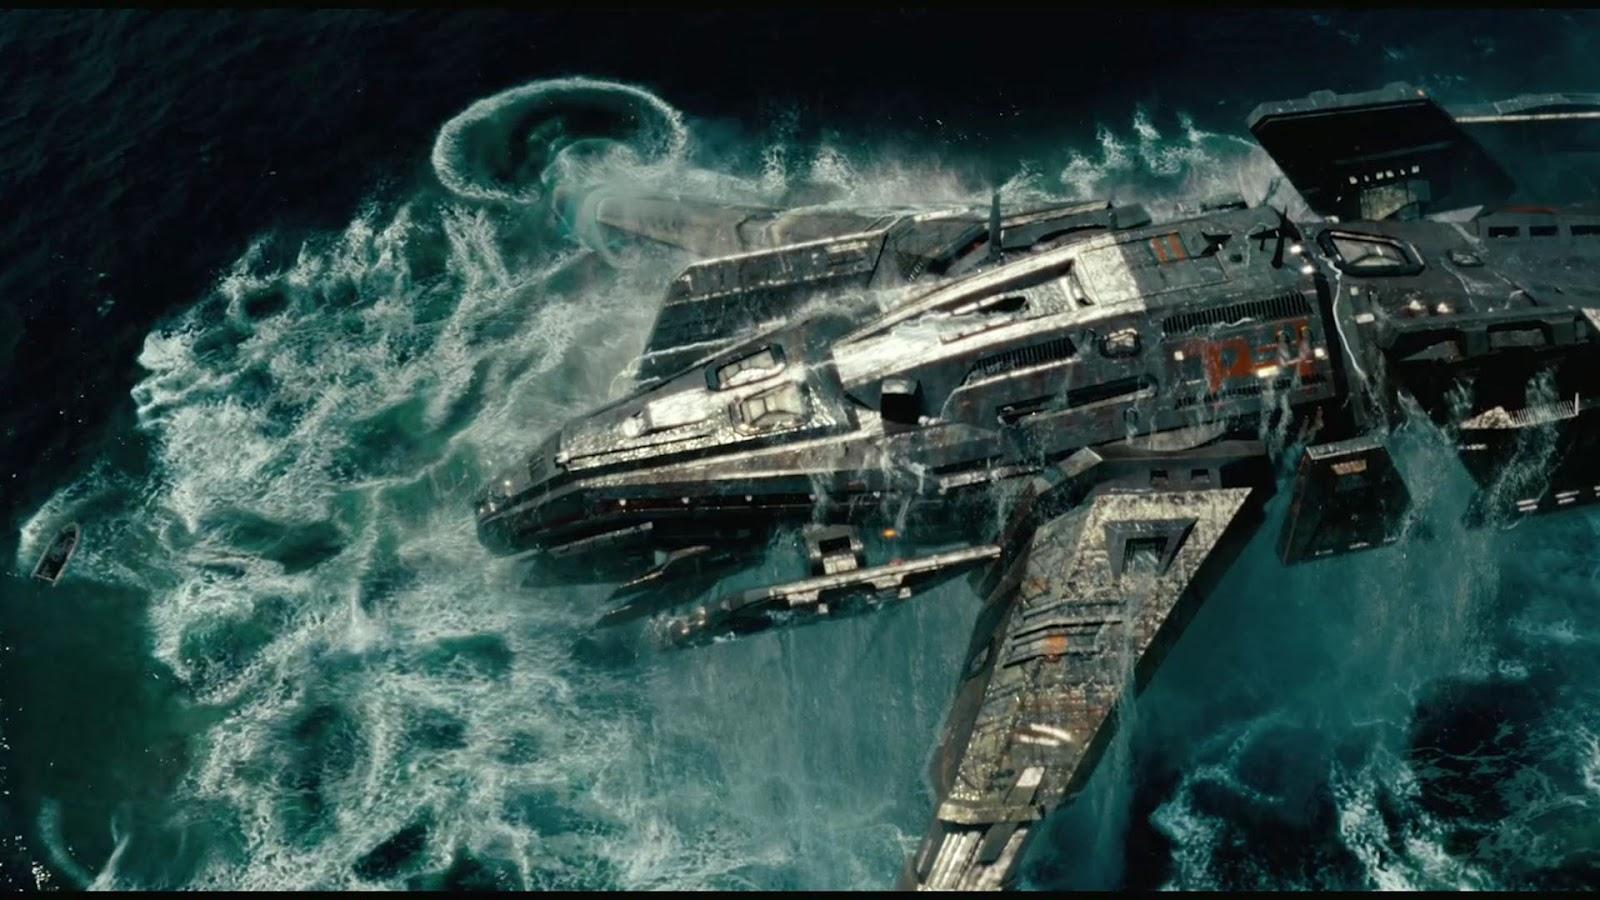 http://2.bp.blogspot.com/-UChAyruty0k/UBHpyKYn8uI/AAAAAAAACgs/mLWZbXIP7gM/s1600/Battleship-169.jpg